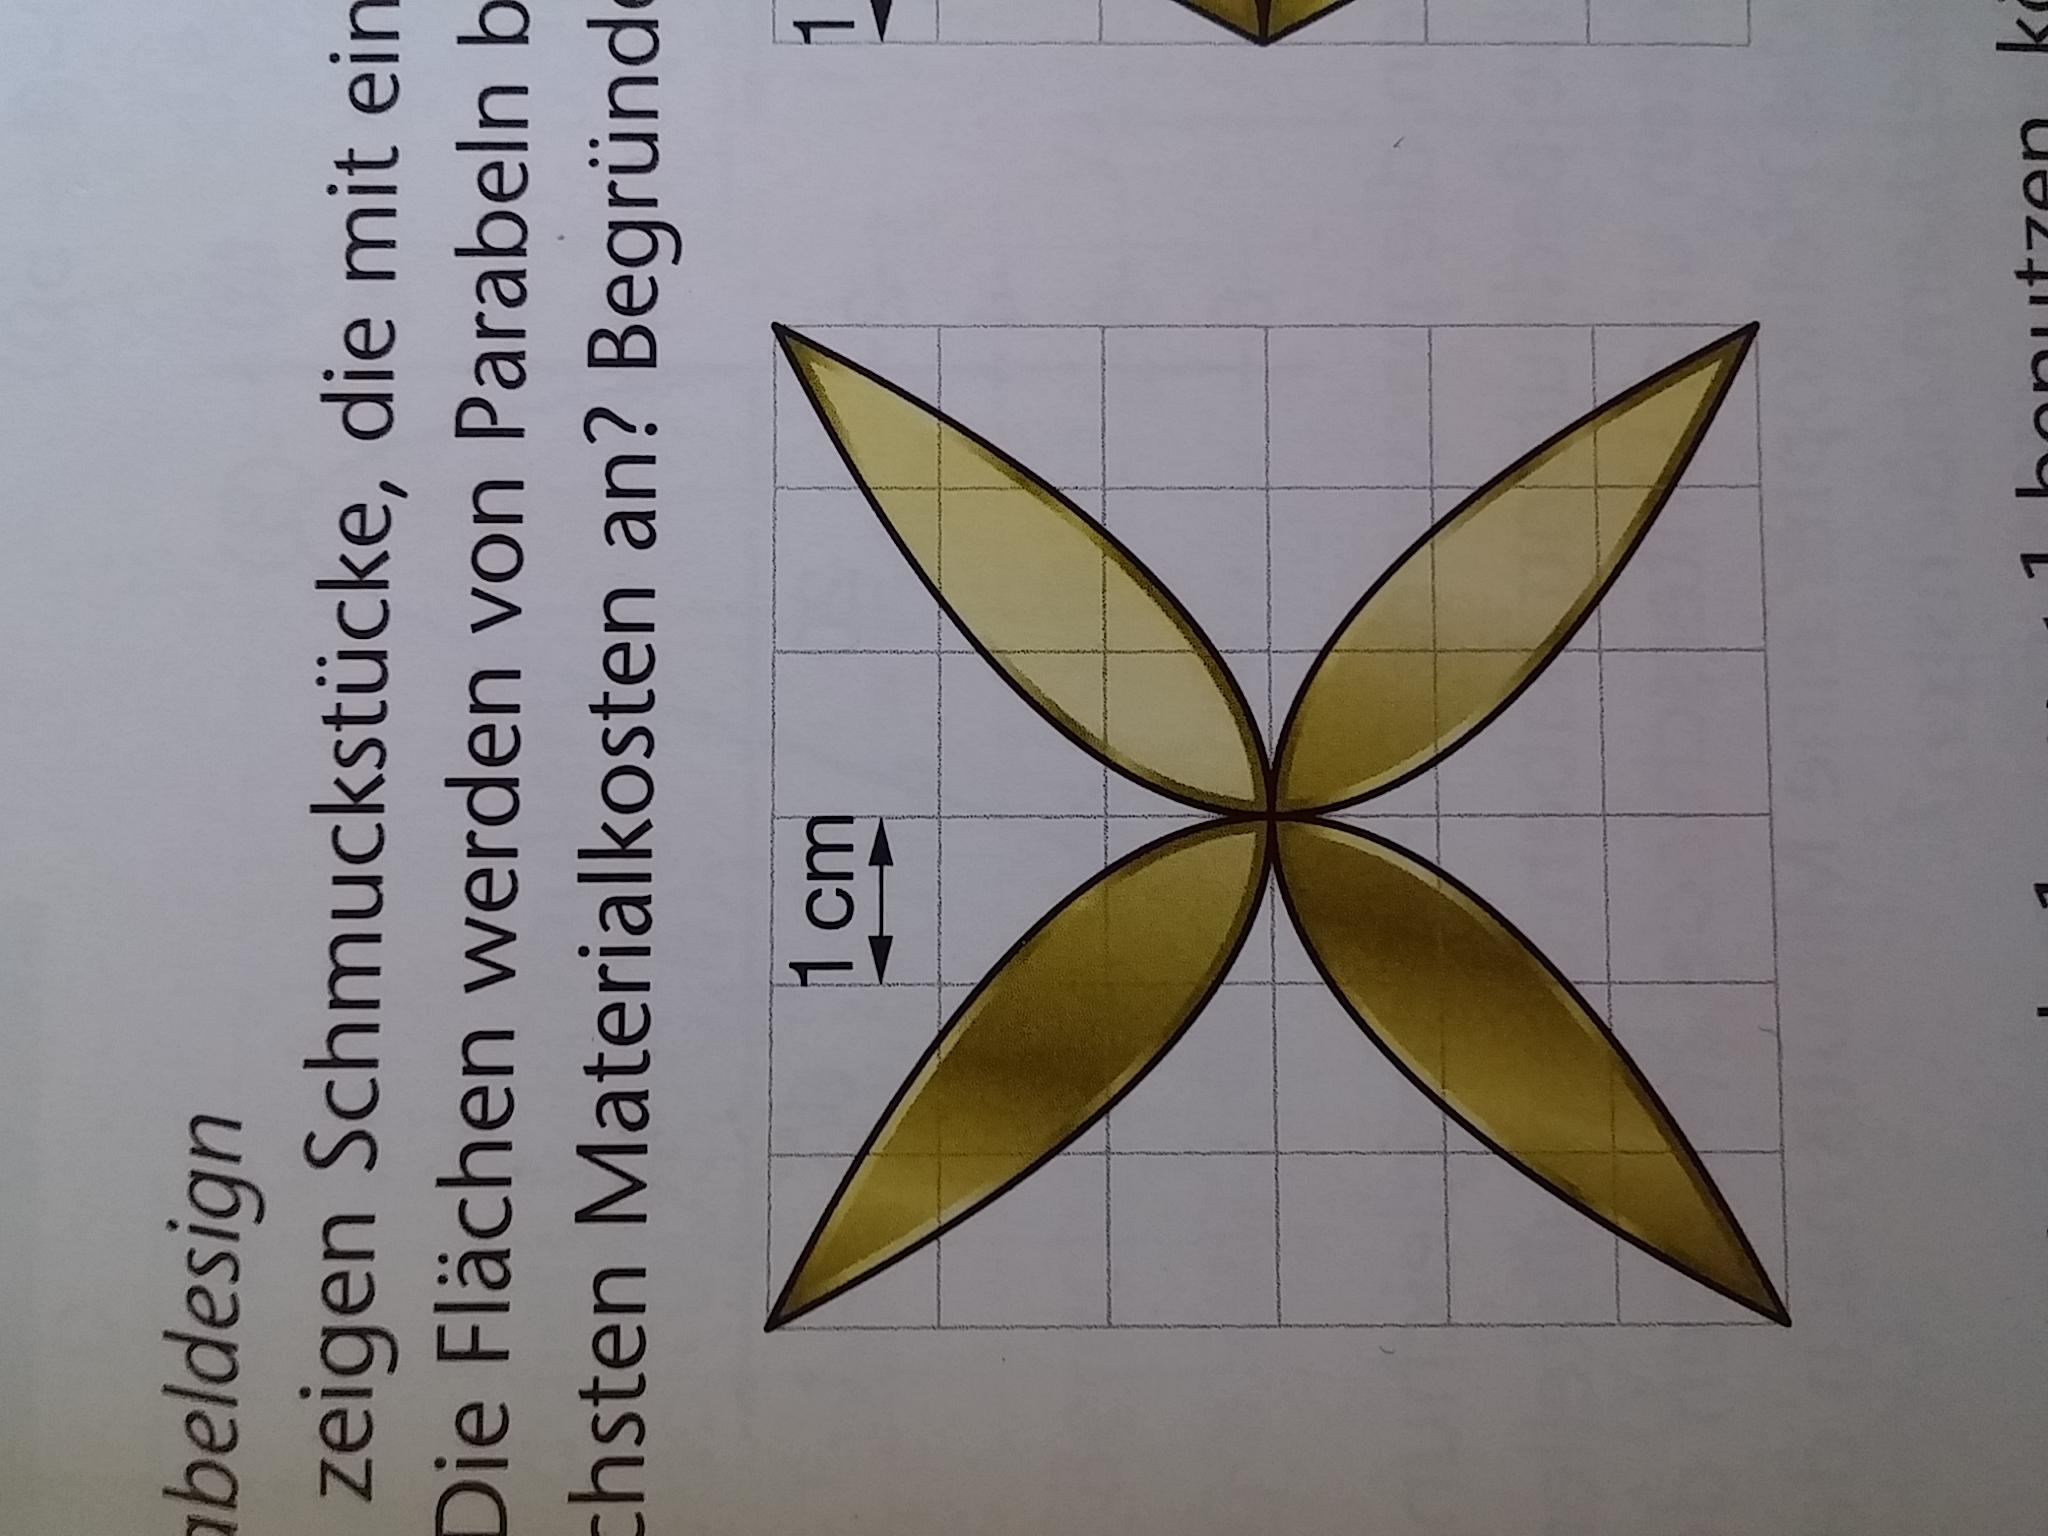 integralrechnung fläche bestimmen? (integral, flächeninhalt)